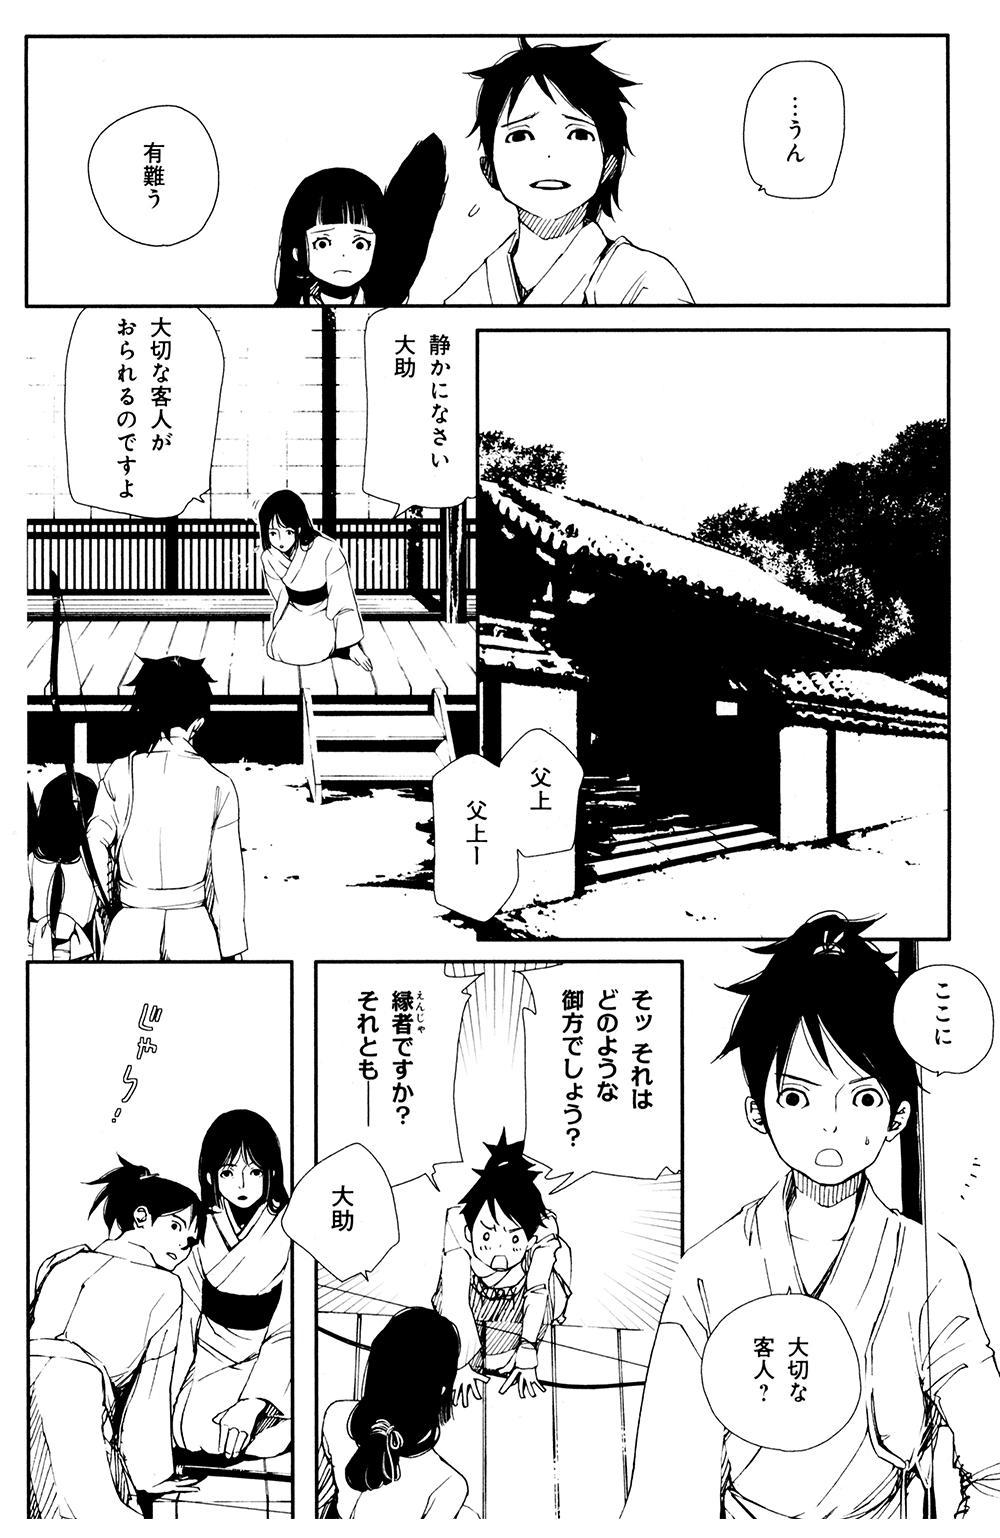 朱黒の仁 第1話①syukoku-1-12.jpg